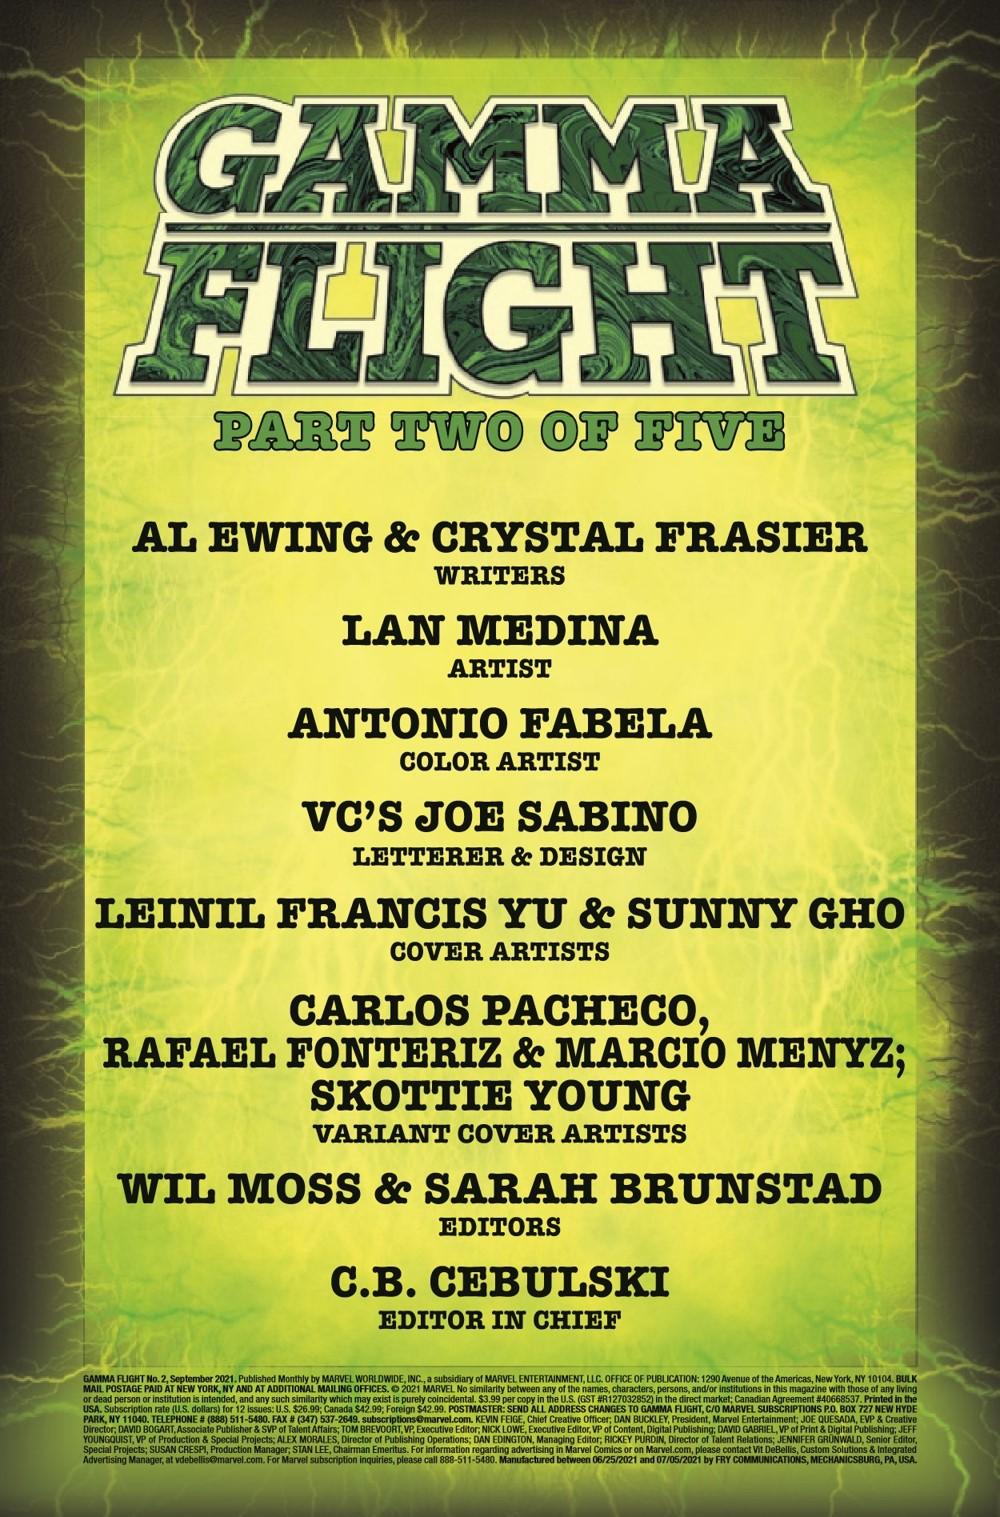 GAMMAF2021002_Preview-2 ComicList Previews: GAMMA FLIGHT #2 (OF 5)